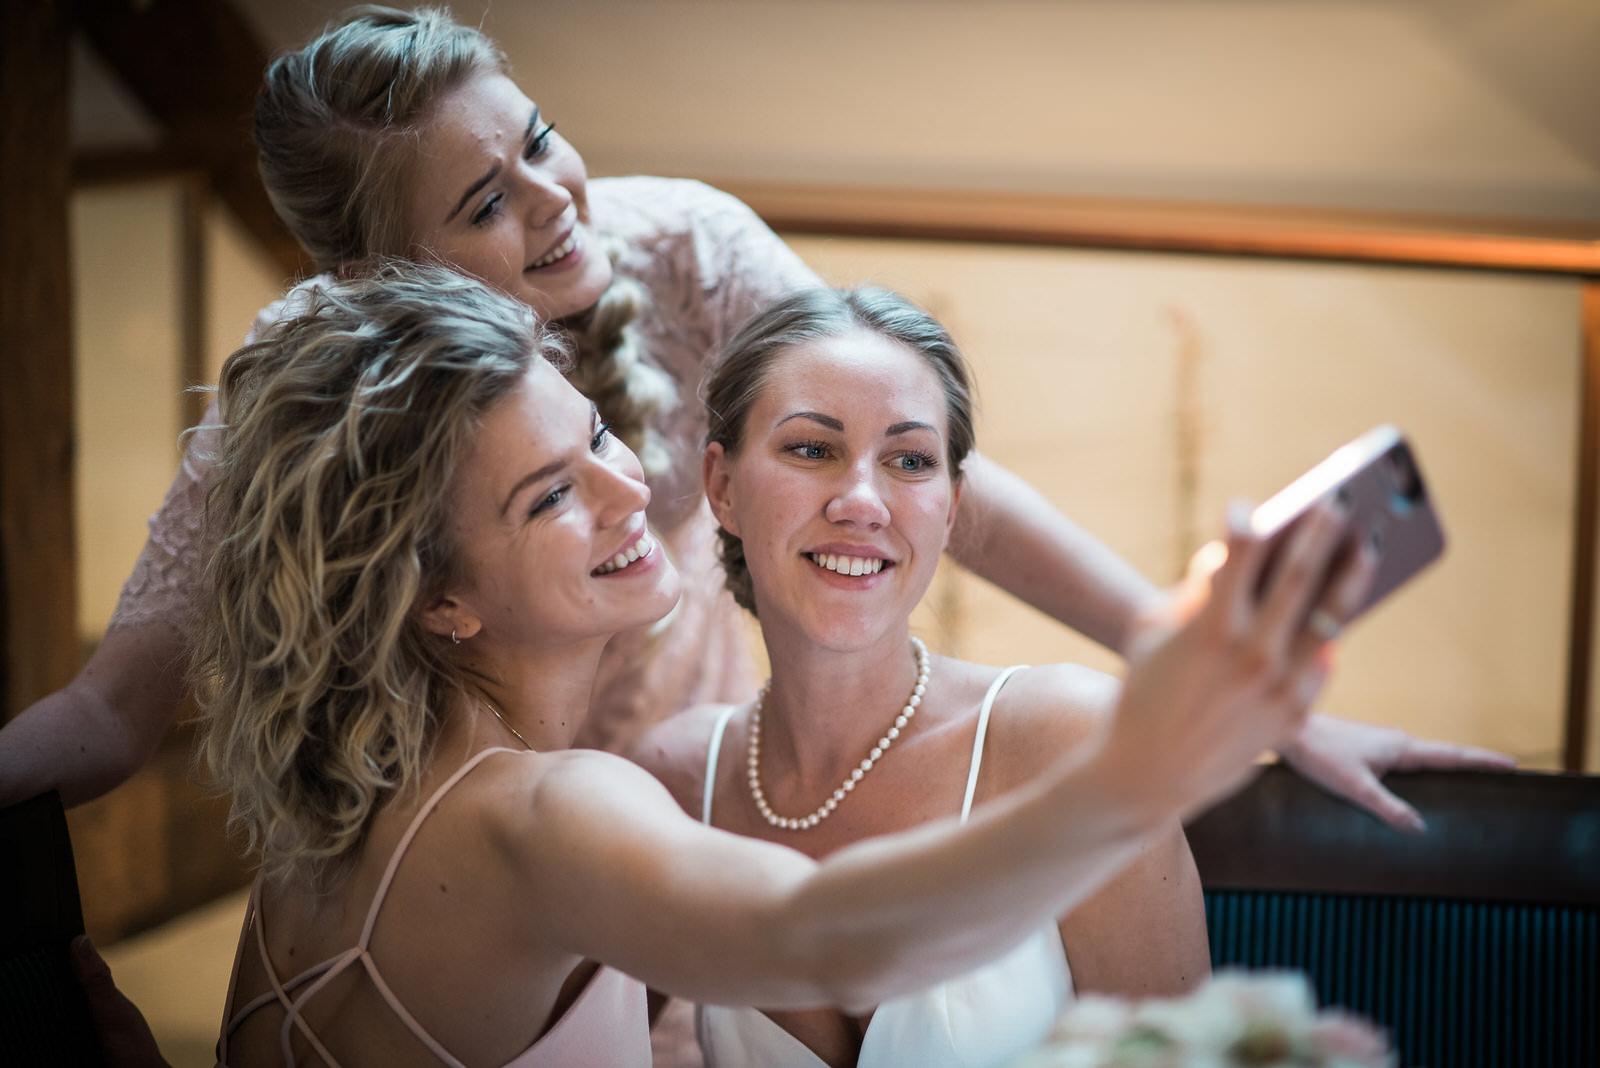 Pixlight-bryllup-Ingrid-Magnus1415.jpg